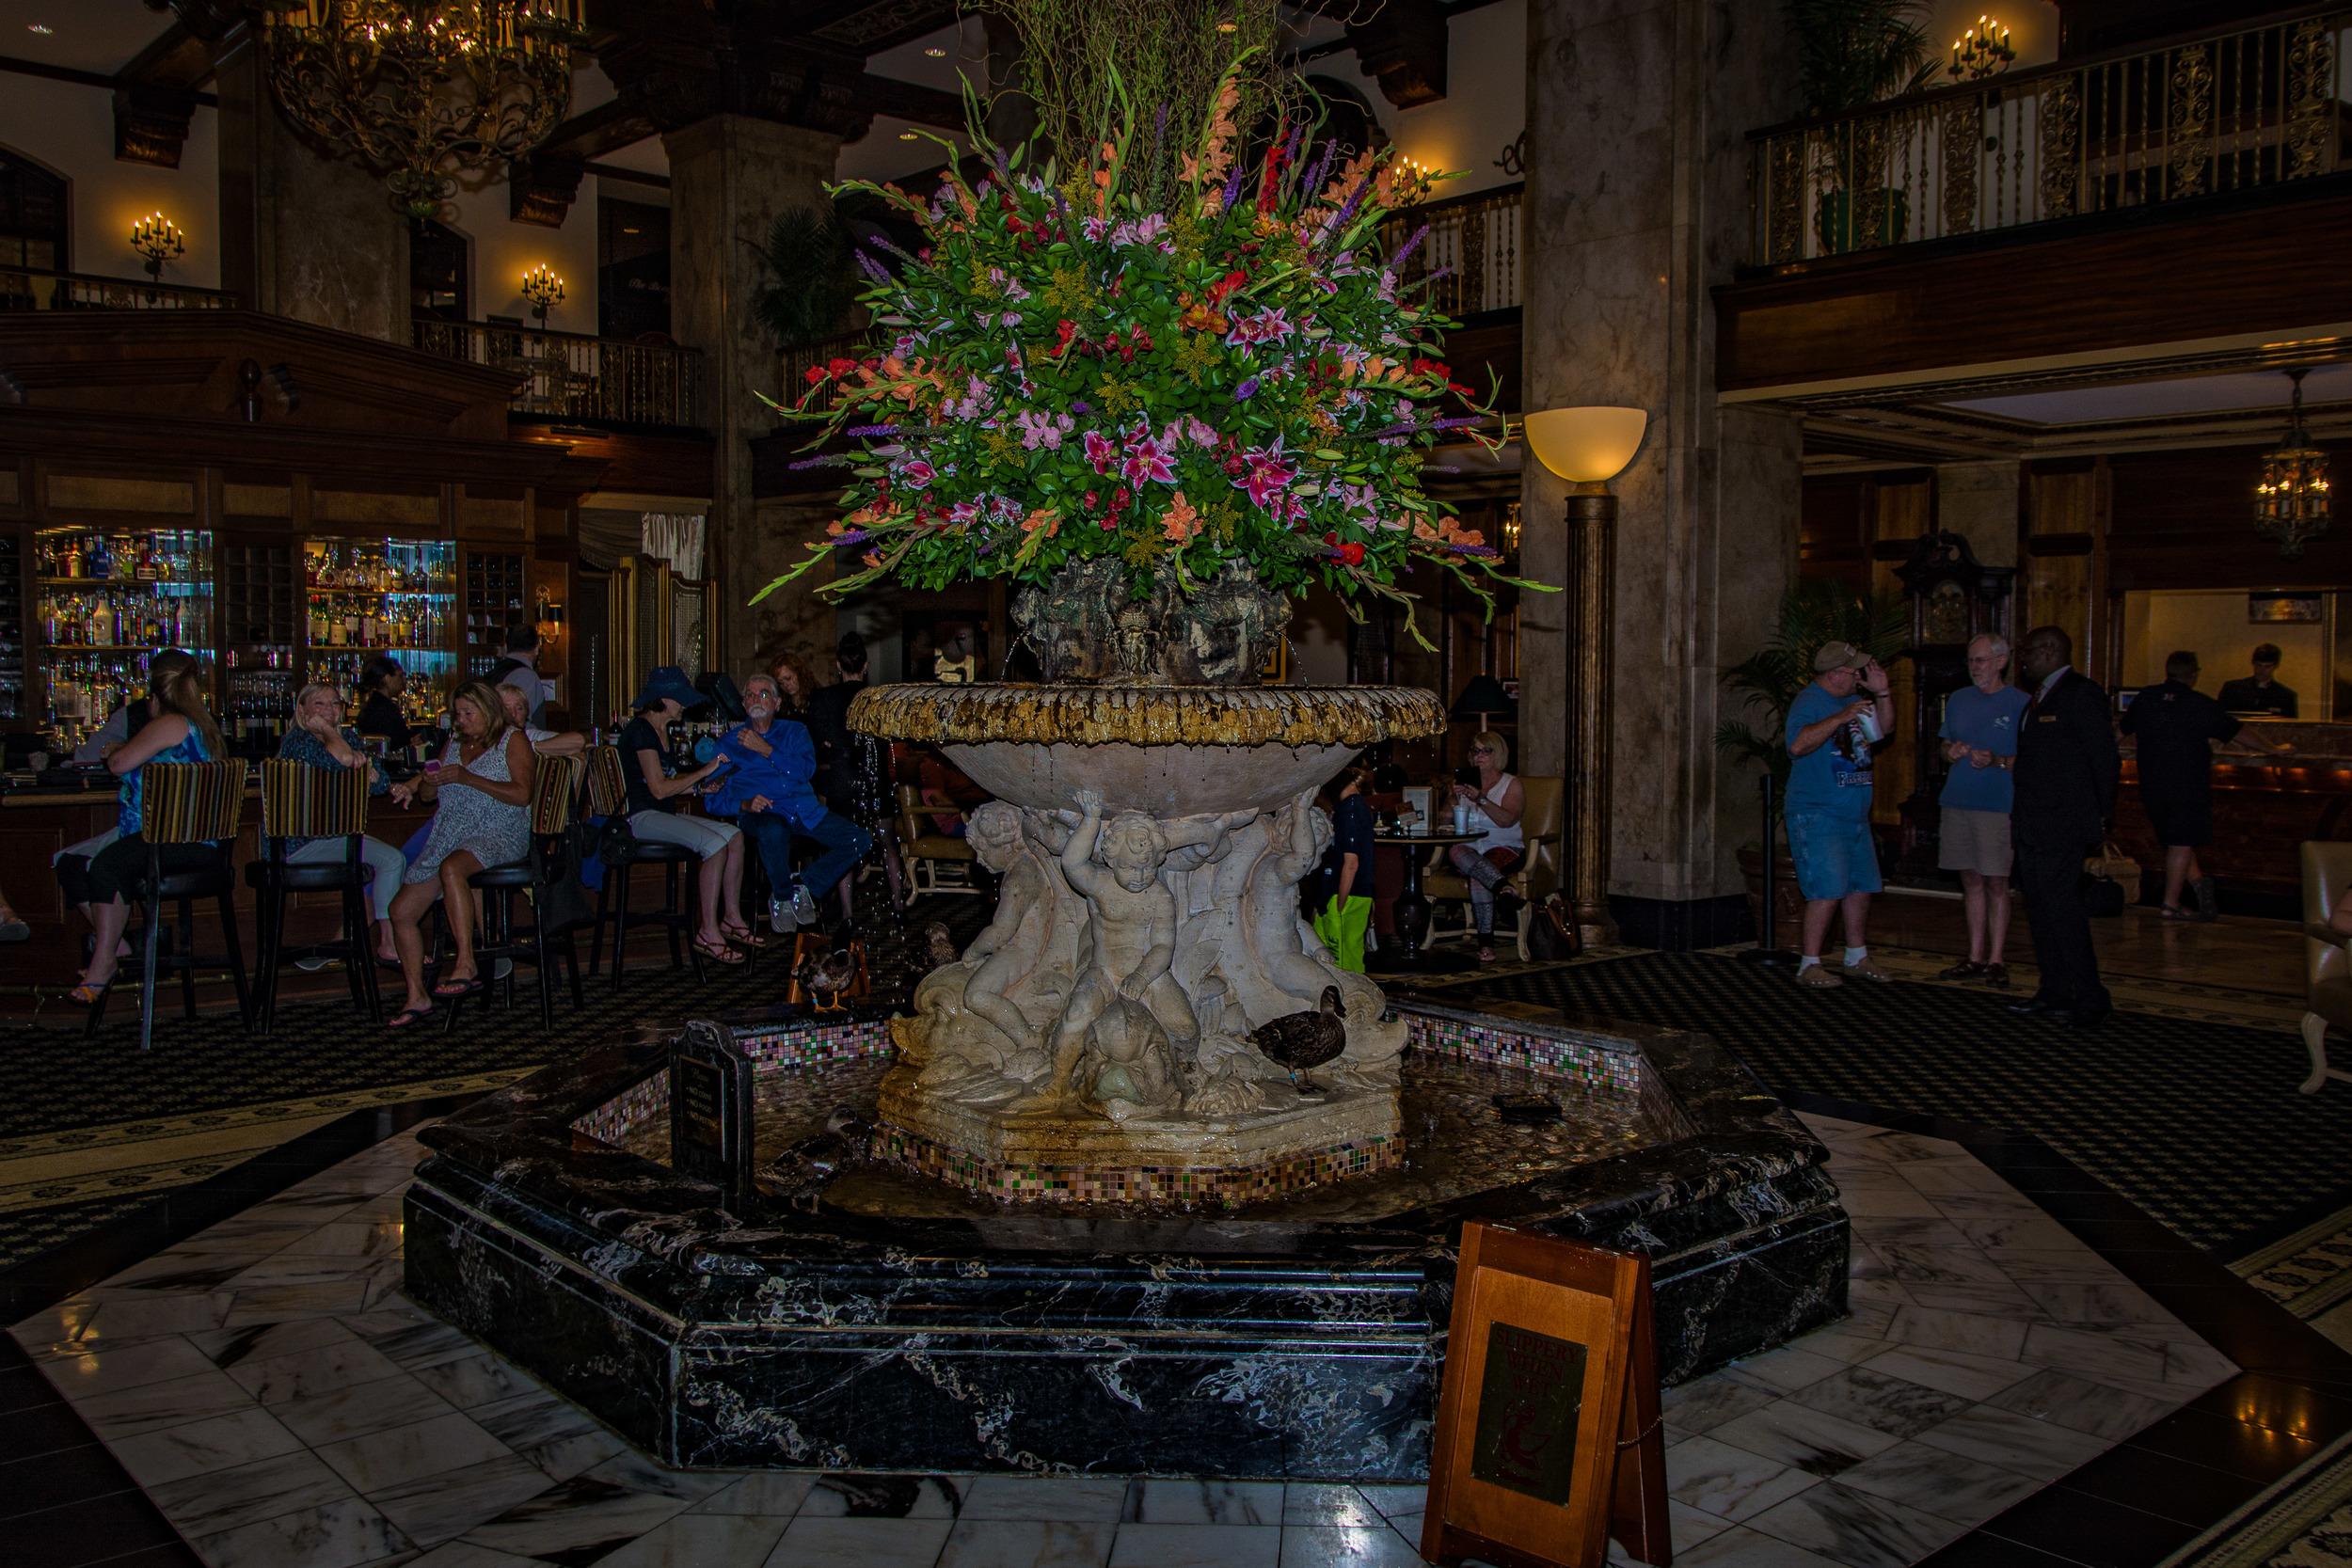 The lobby fountain where the ducks hang.